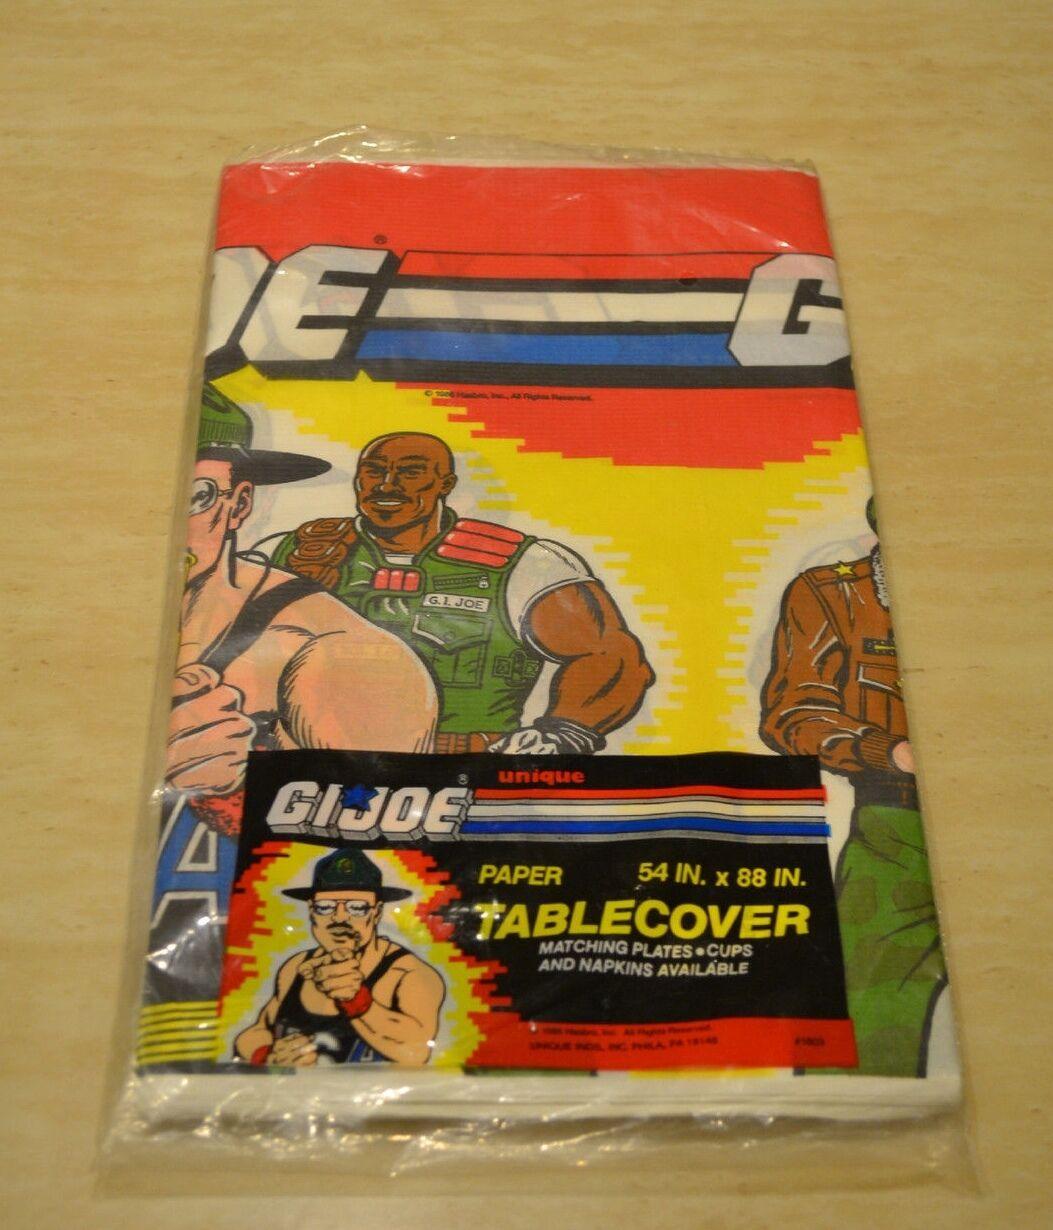 Rare Vintage G.I. Joe Paper Tablecover Party Tableware  54 x 88 - NIP Unique